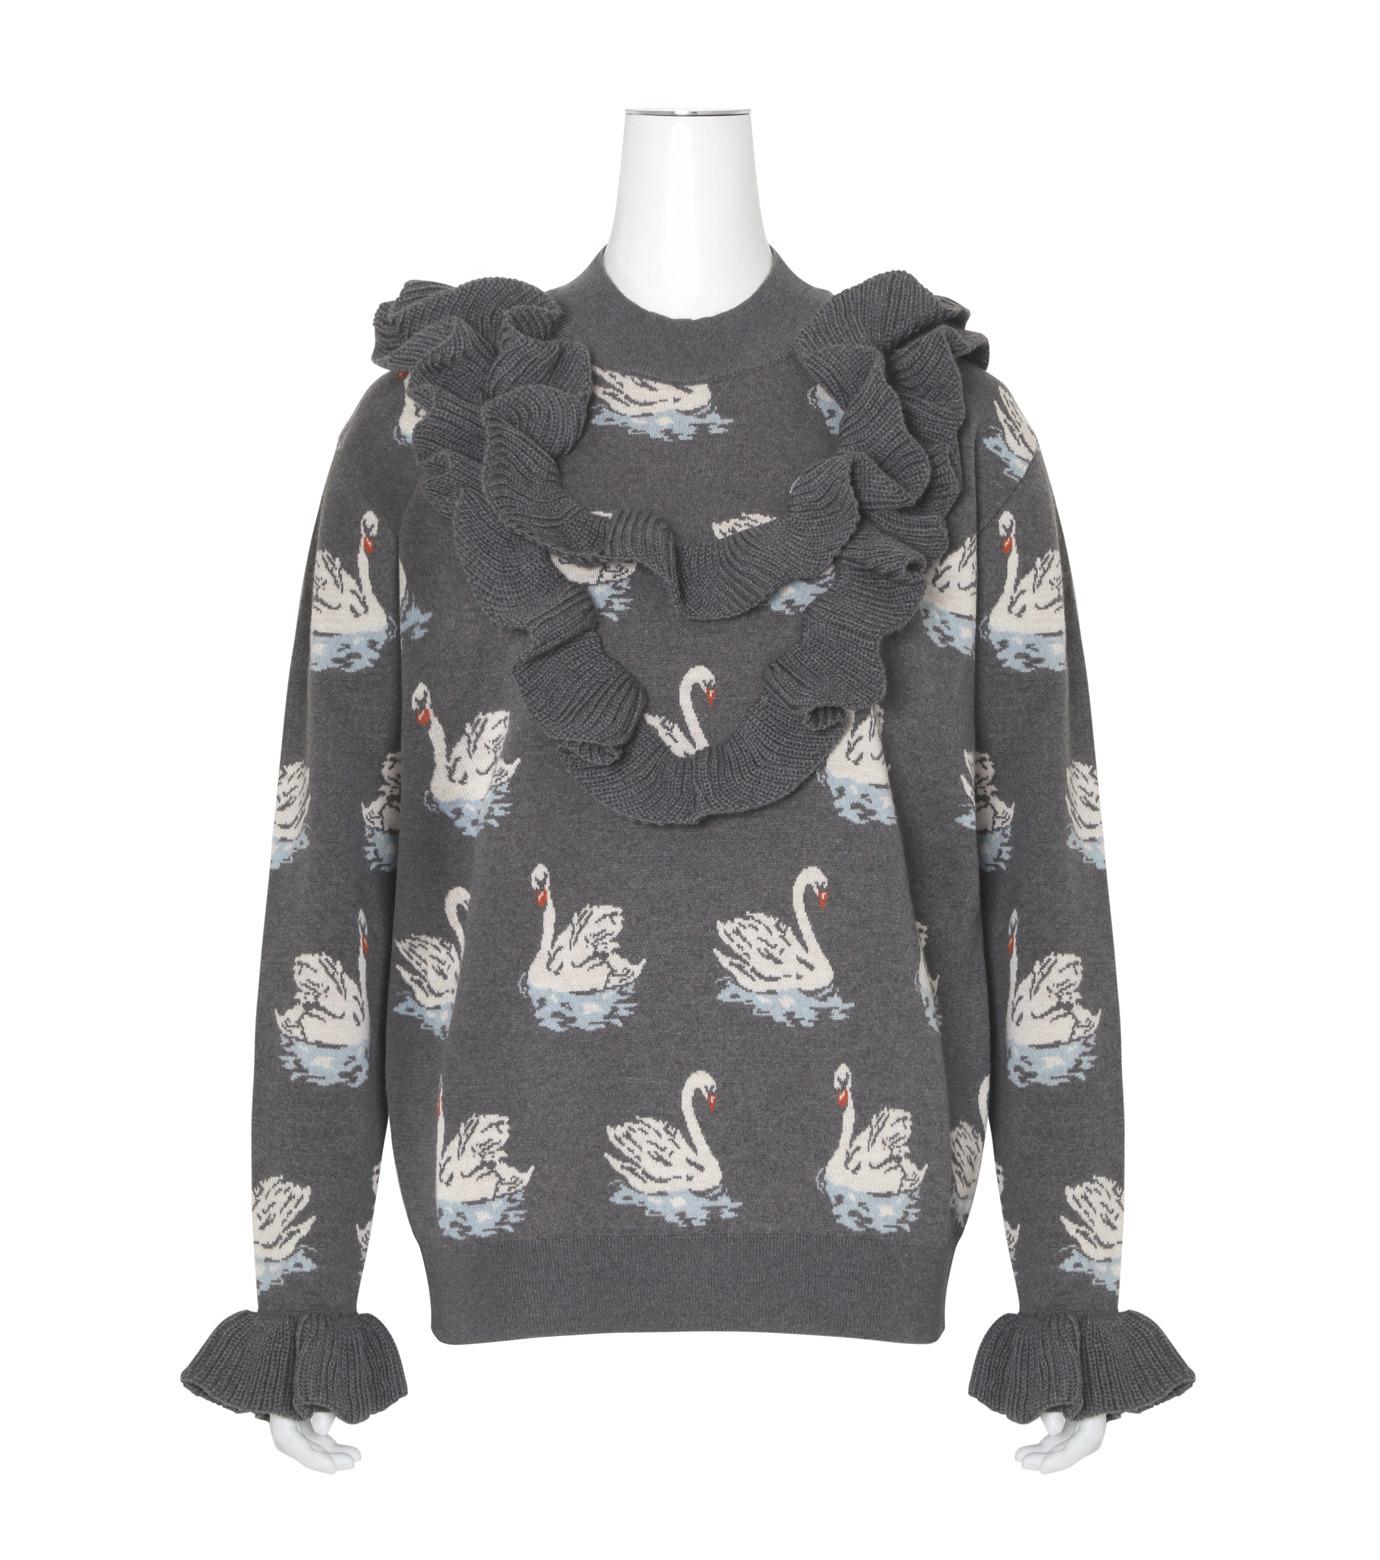 Stella McCartney(ステラマッカートニー)のSwan Jacquard Knit Jumper-GRAY(ニット/knit)-444407-S1724-11 拡大詳細画像1